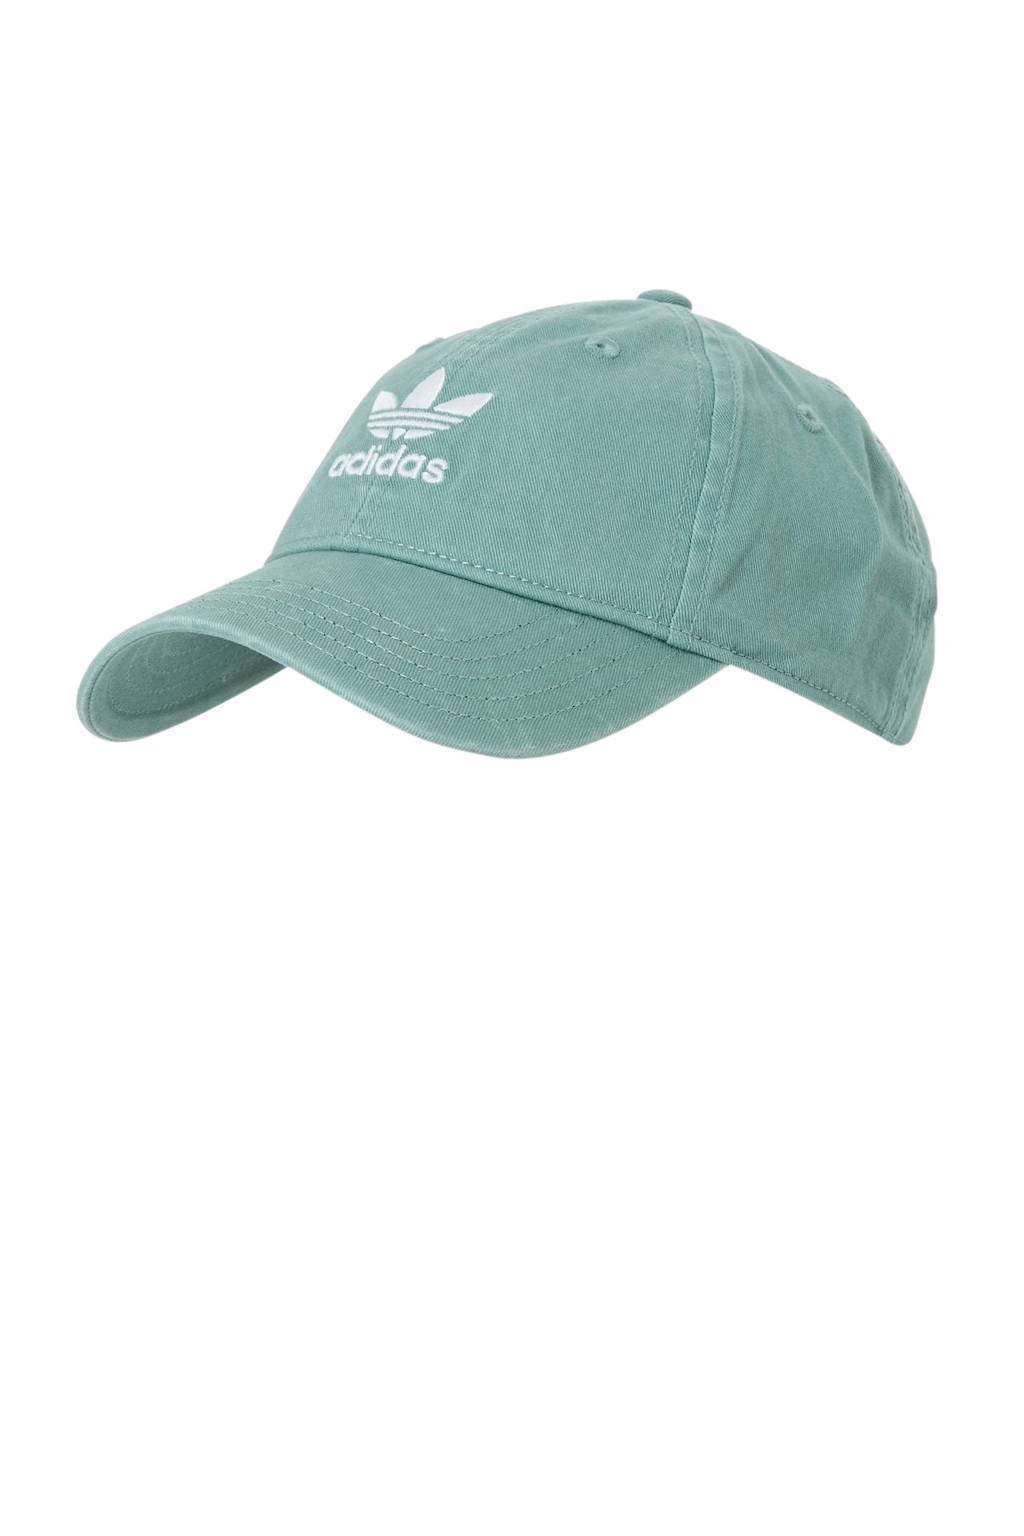 adidas originals Adic washed cap groen, Groen